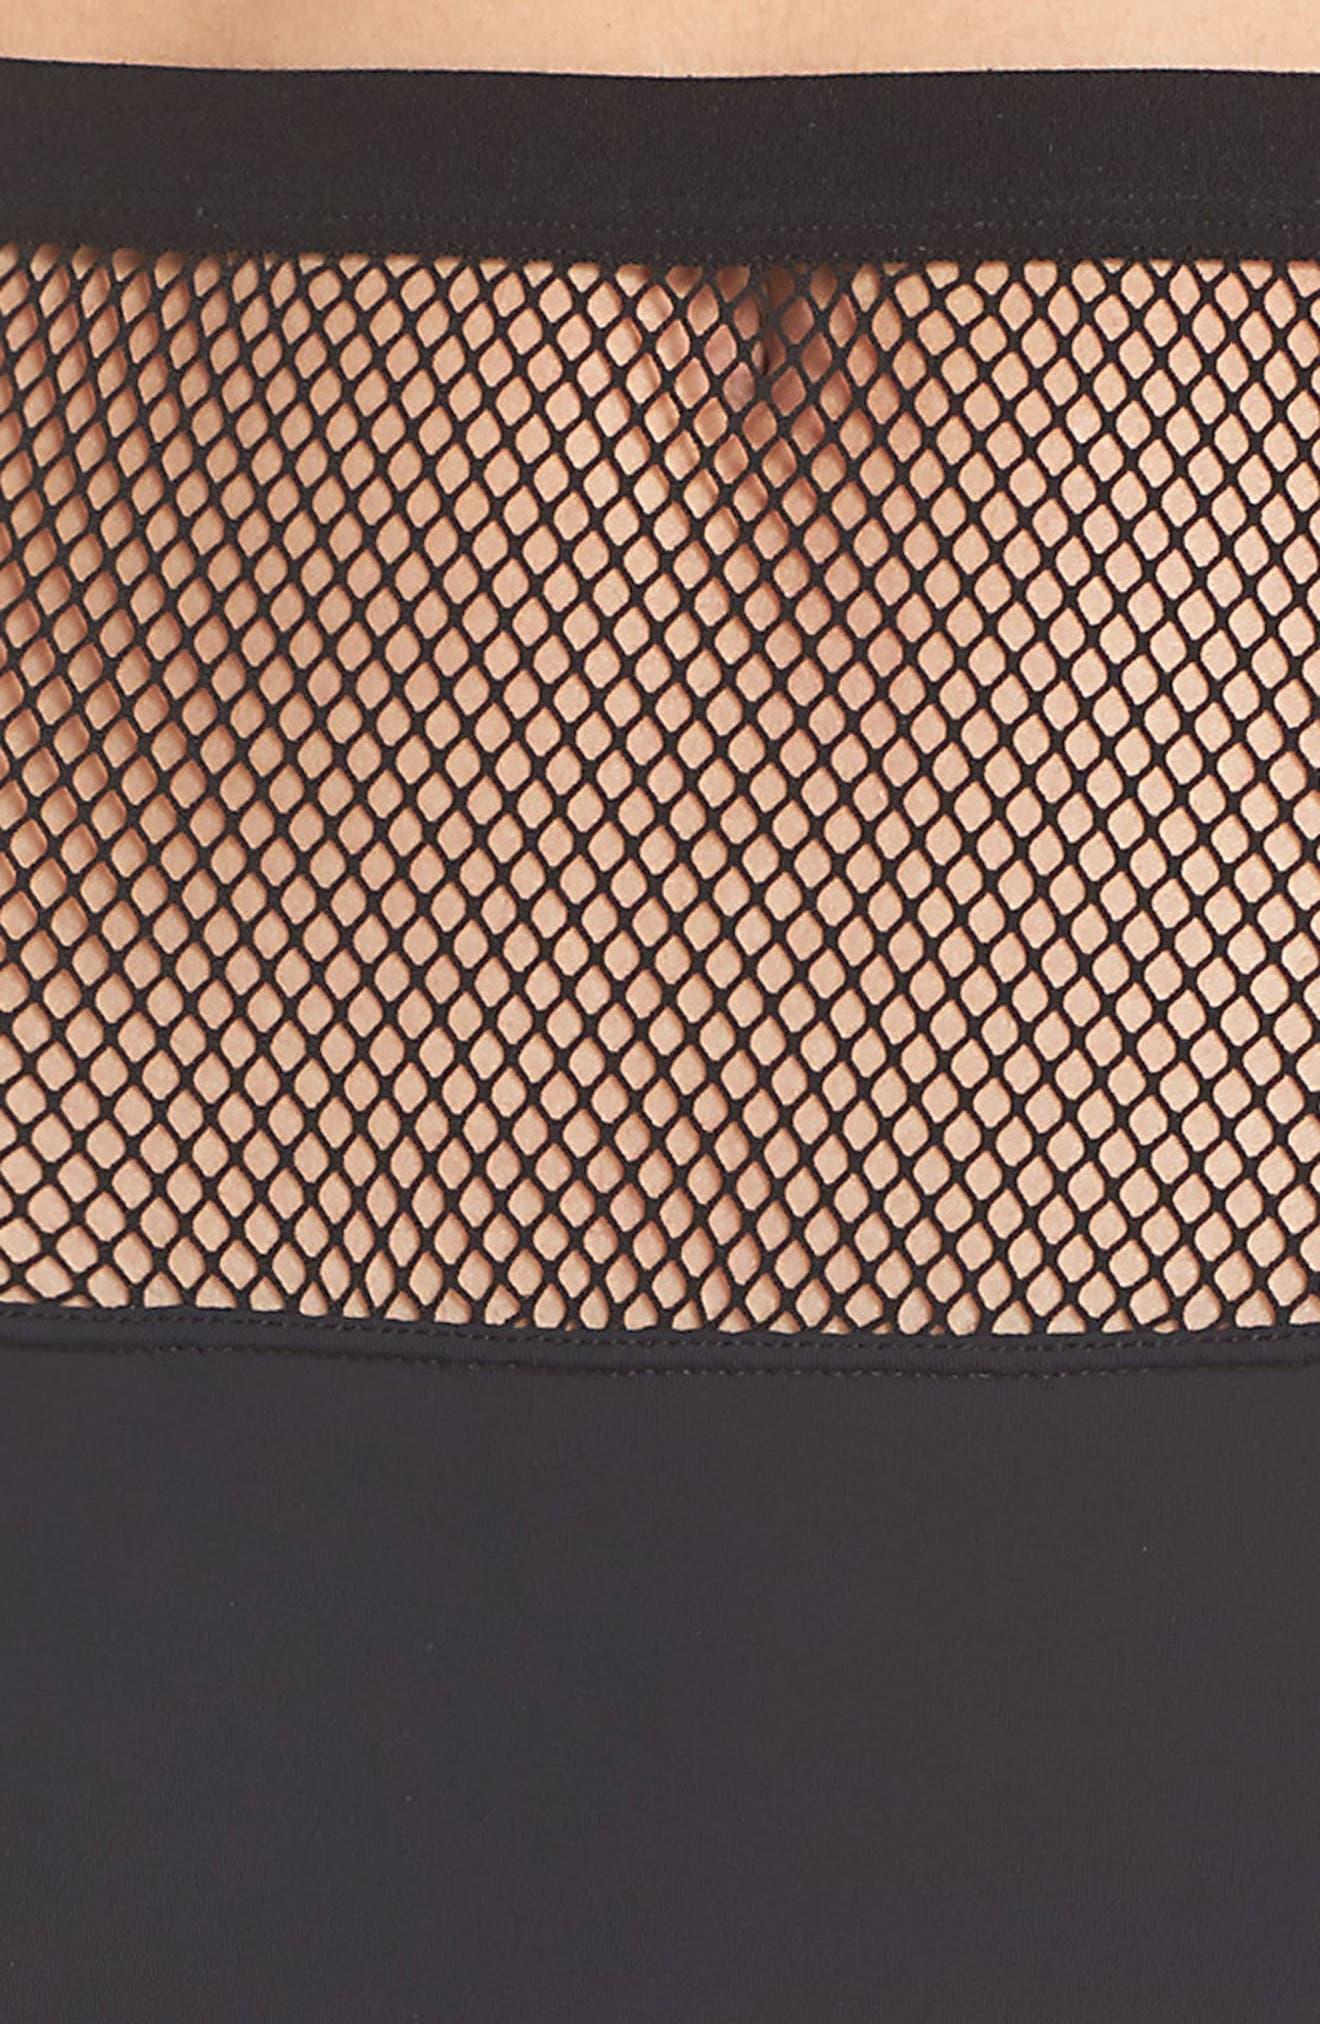 Honeydew Fishnet Hipster Panties,                             Alternate thumbnail 4, color,                             001